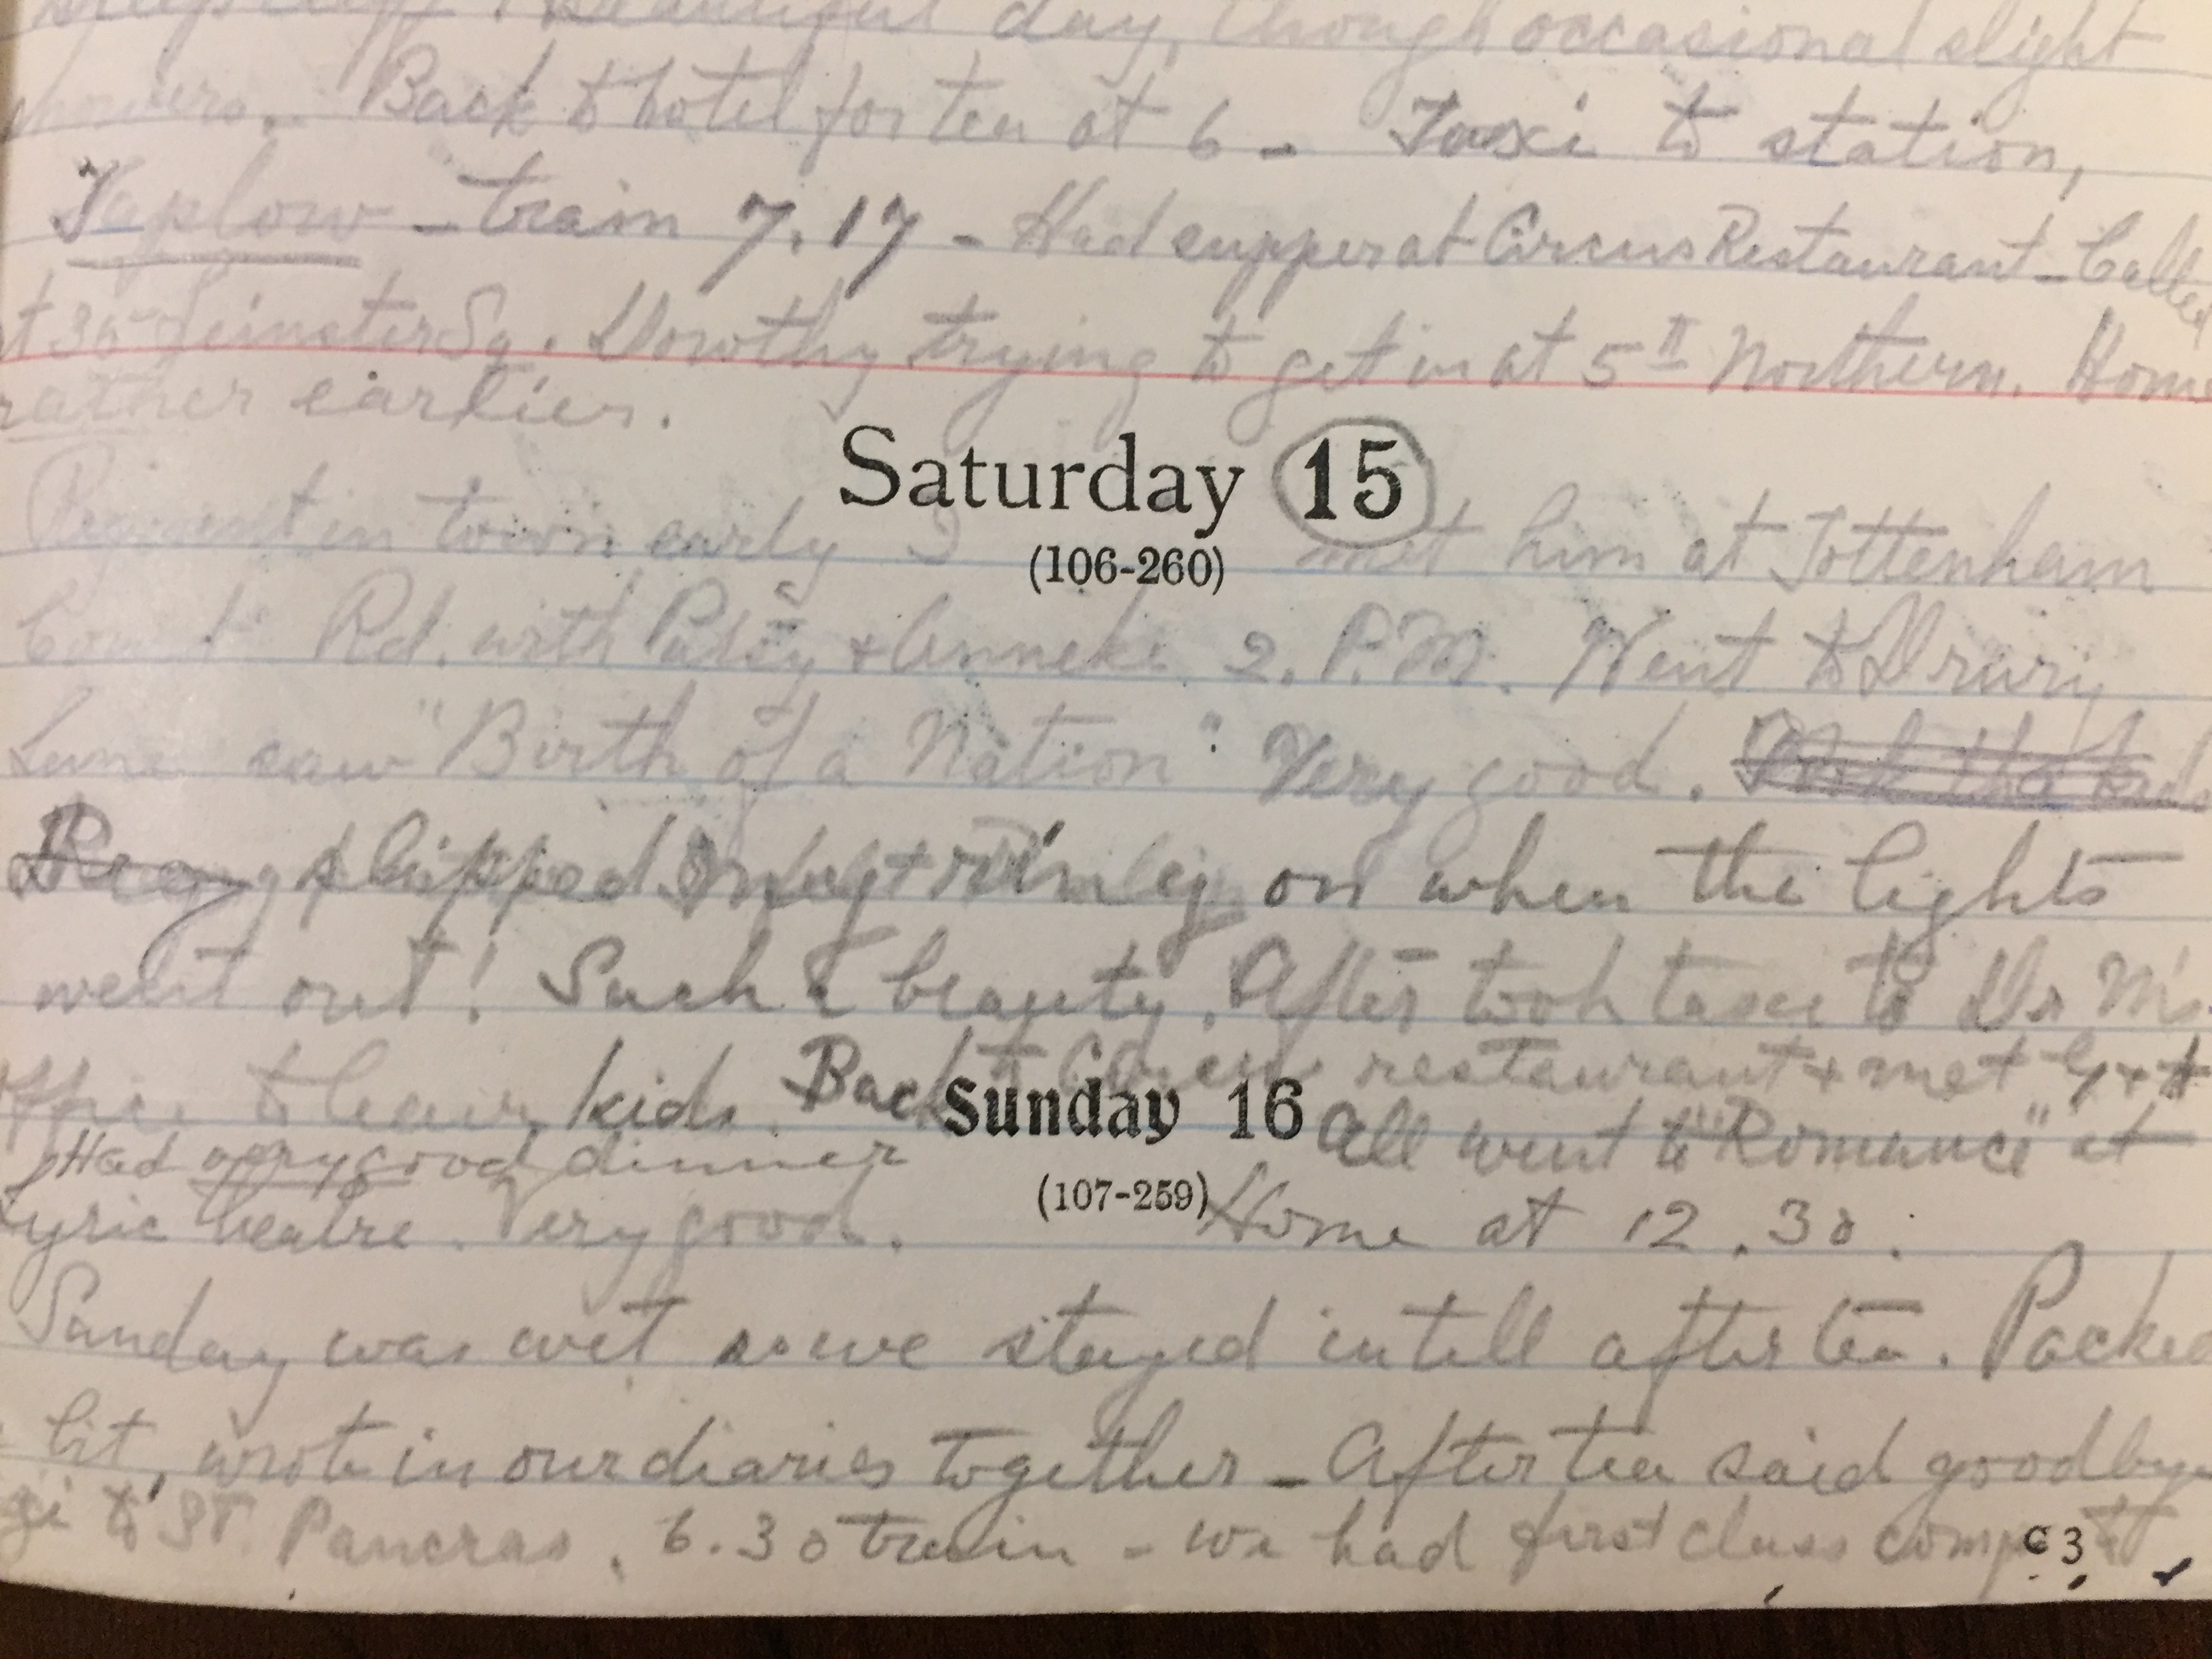 (Nova Scotia Archives)